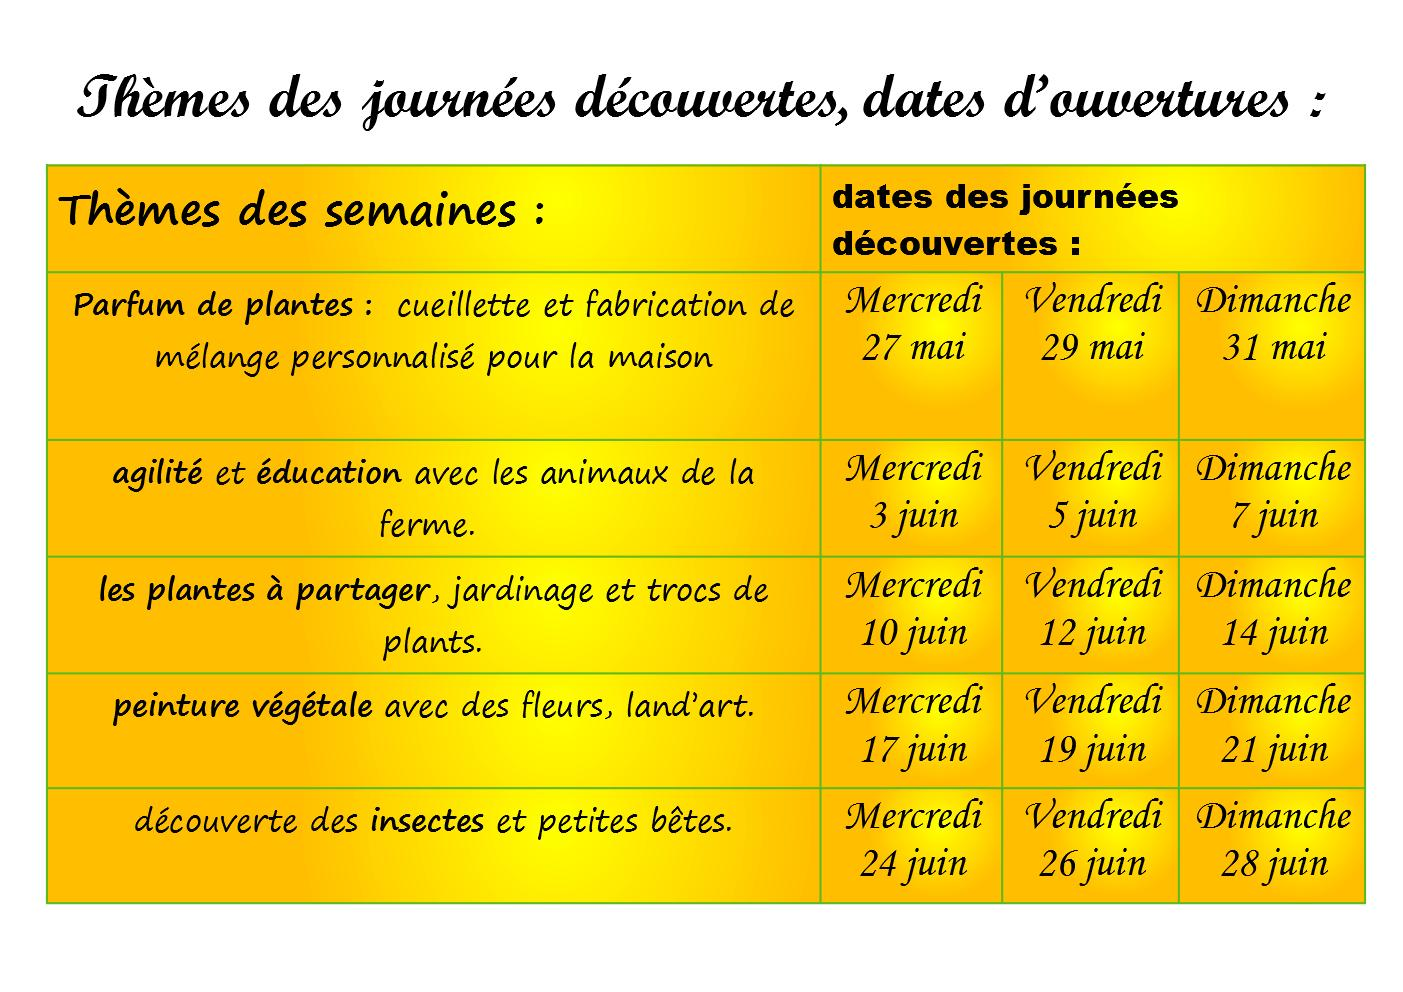 programme fin mai juin 2020 à la ferme calendrier